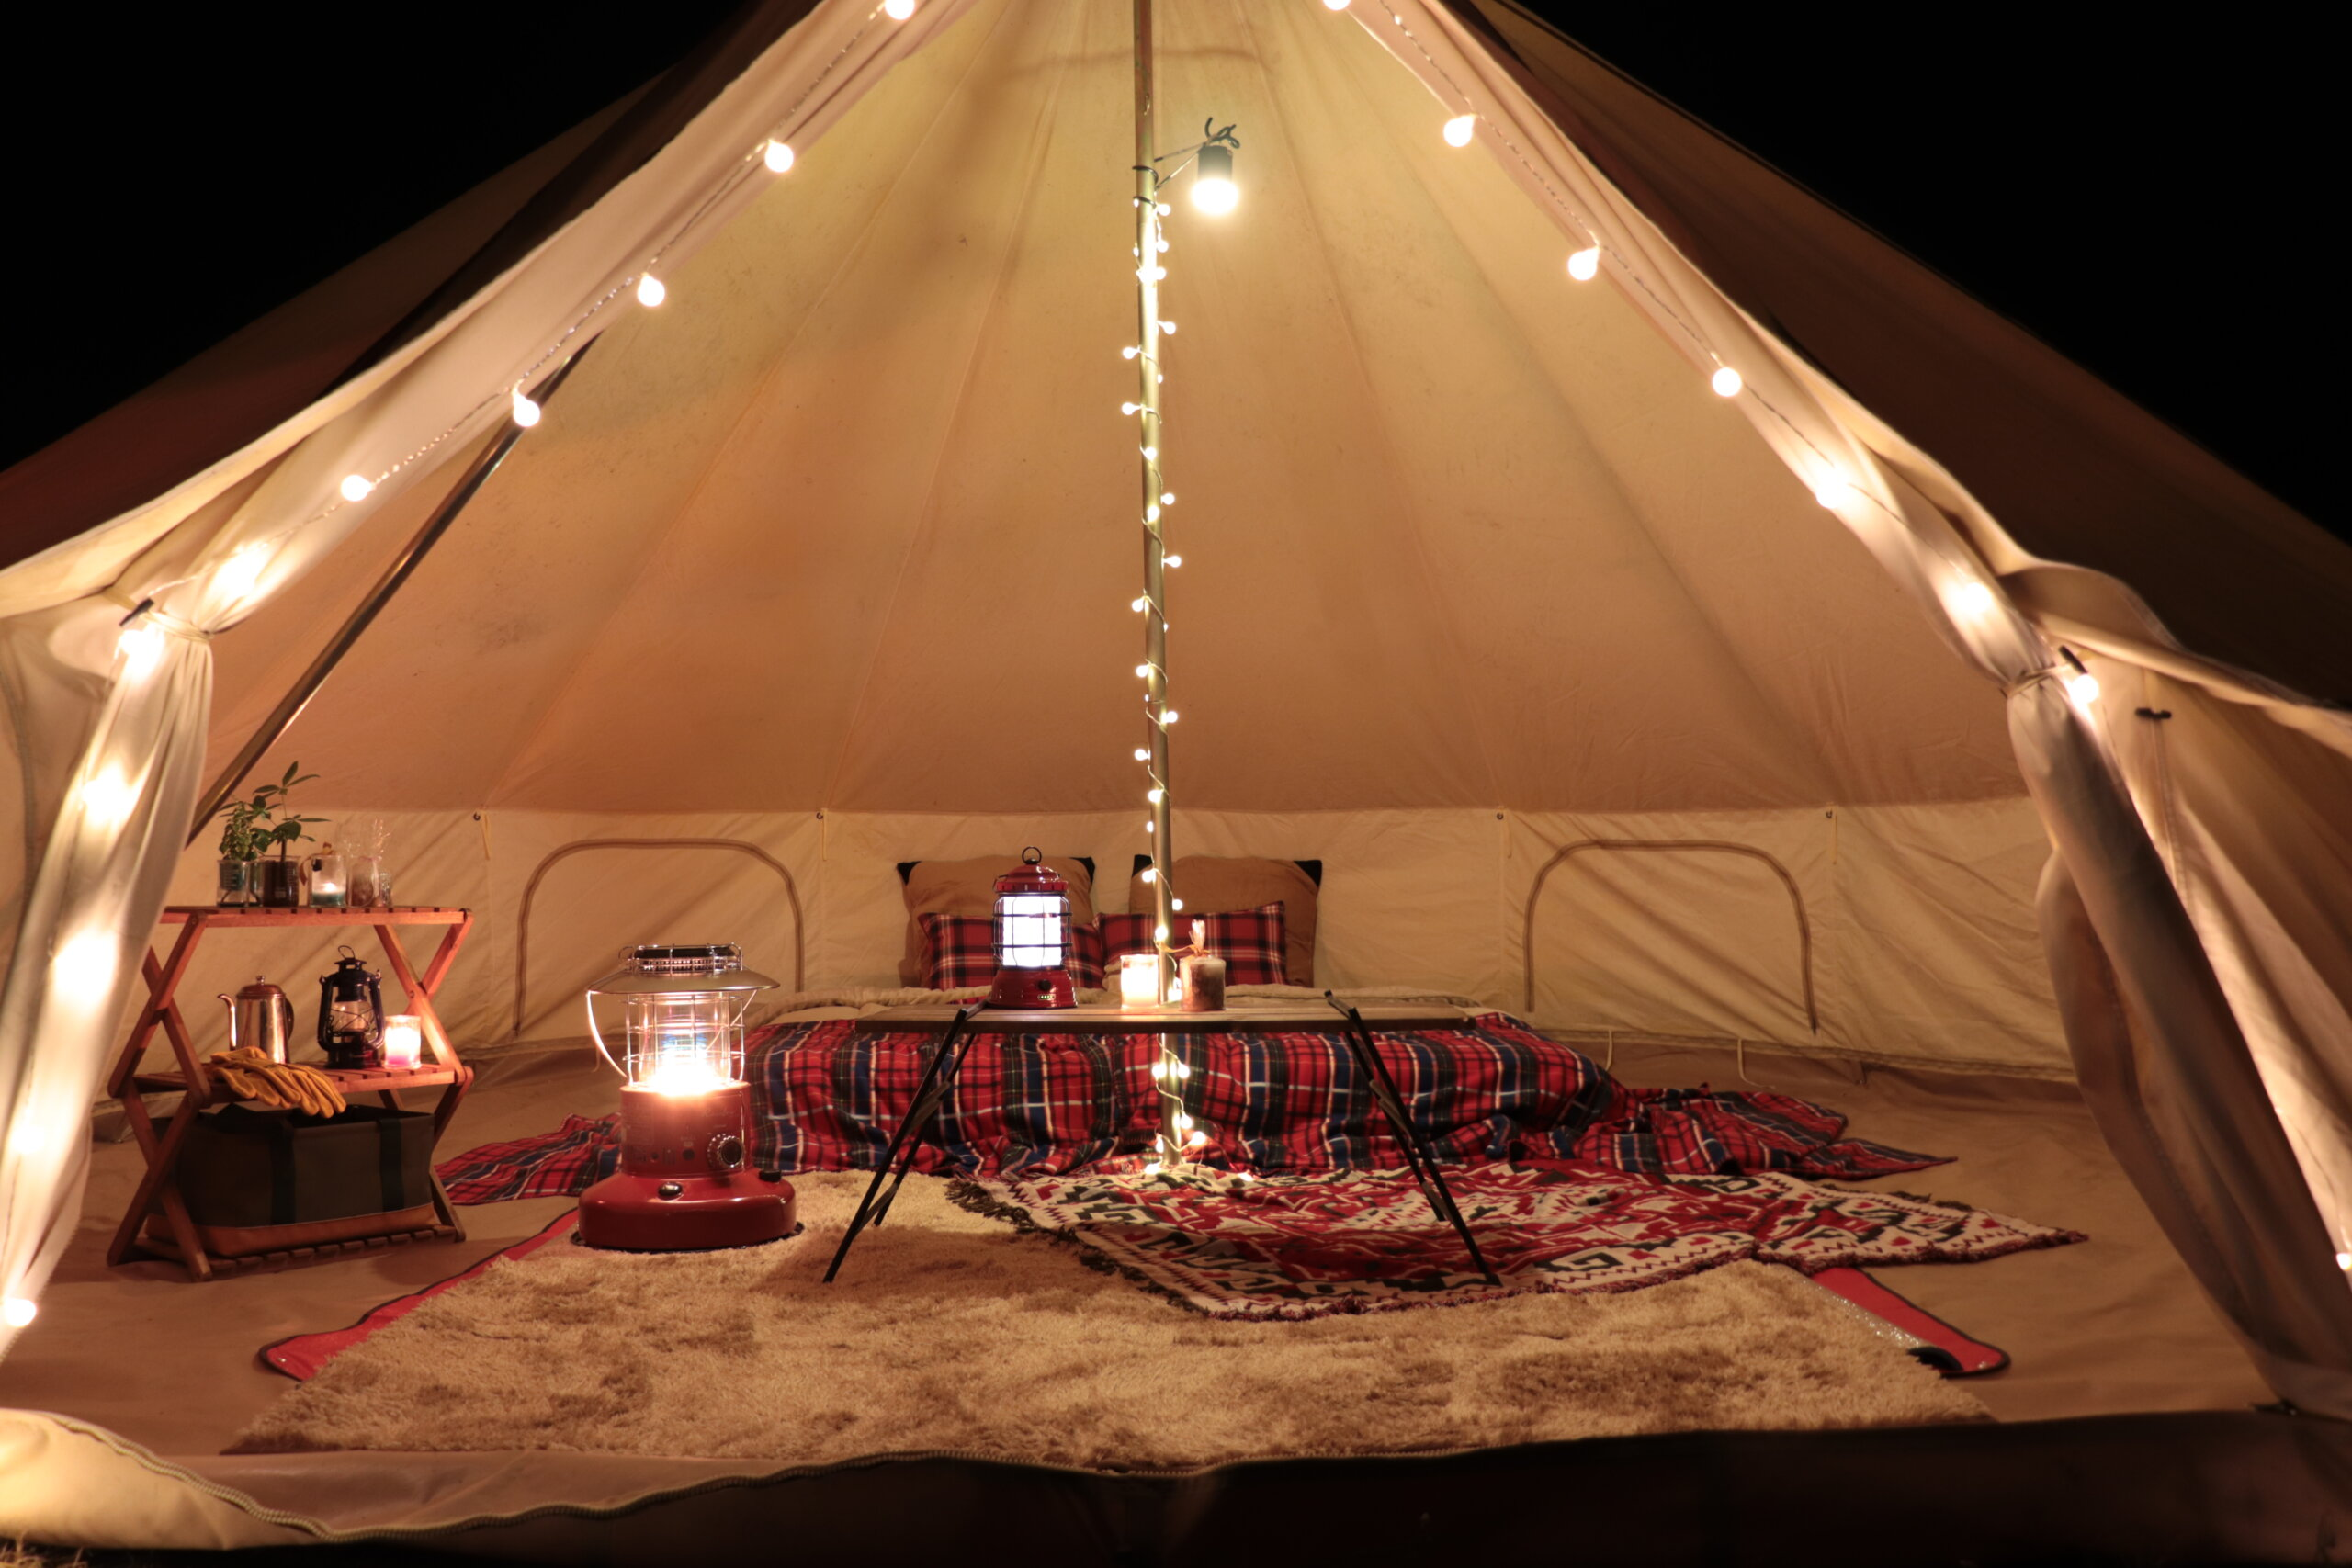 BEYOND VILLAGE北海道大沼露營區:享受可以空手前往的豪華露營體驗